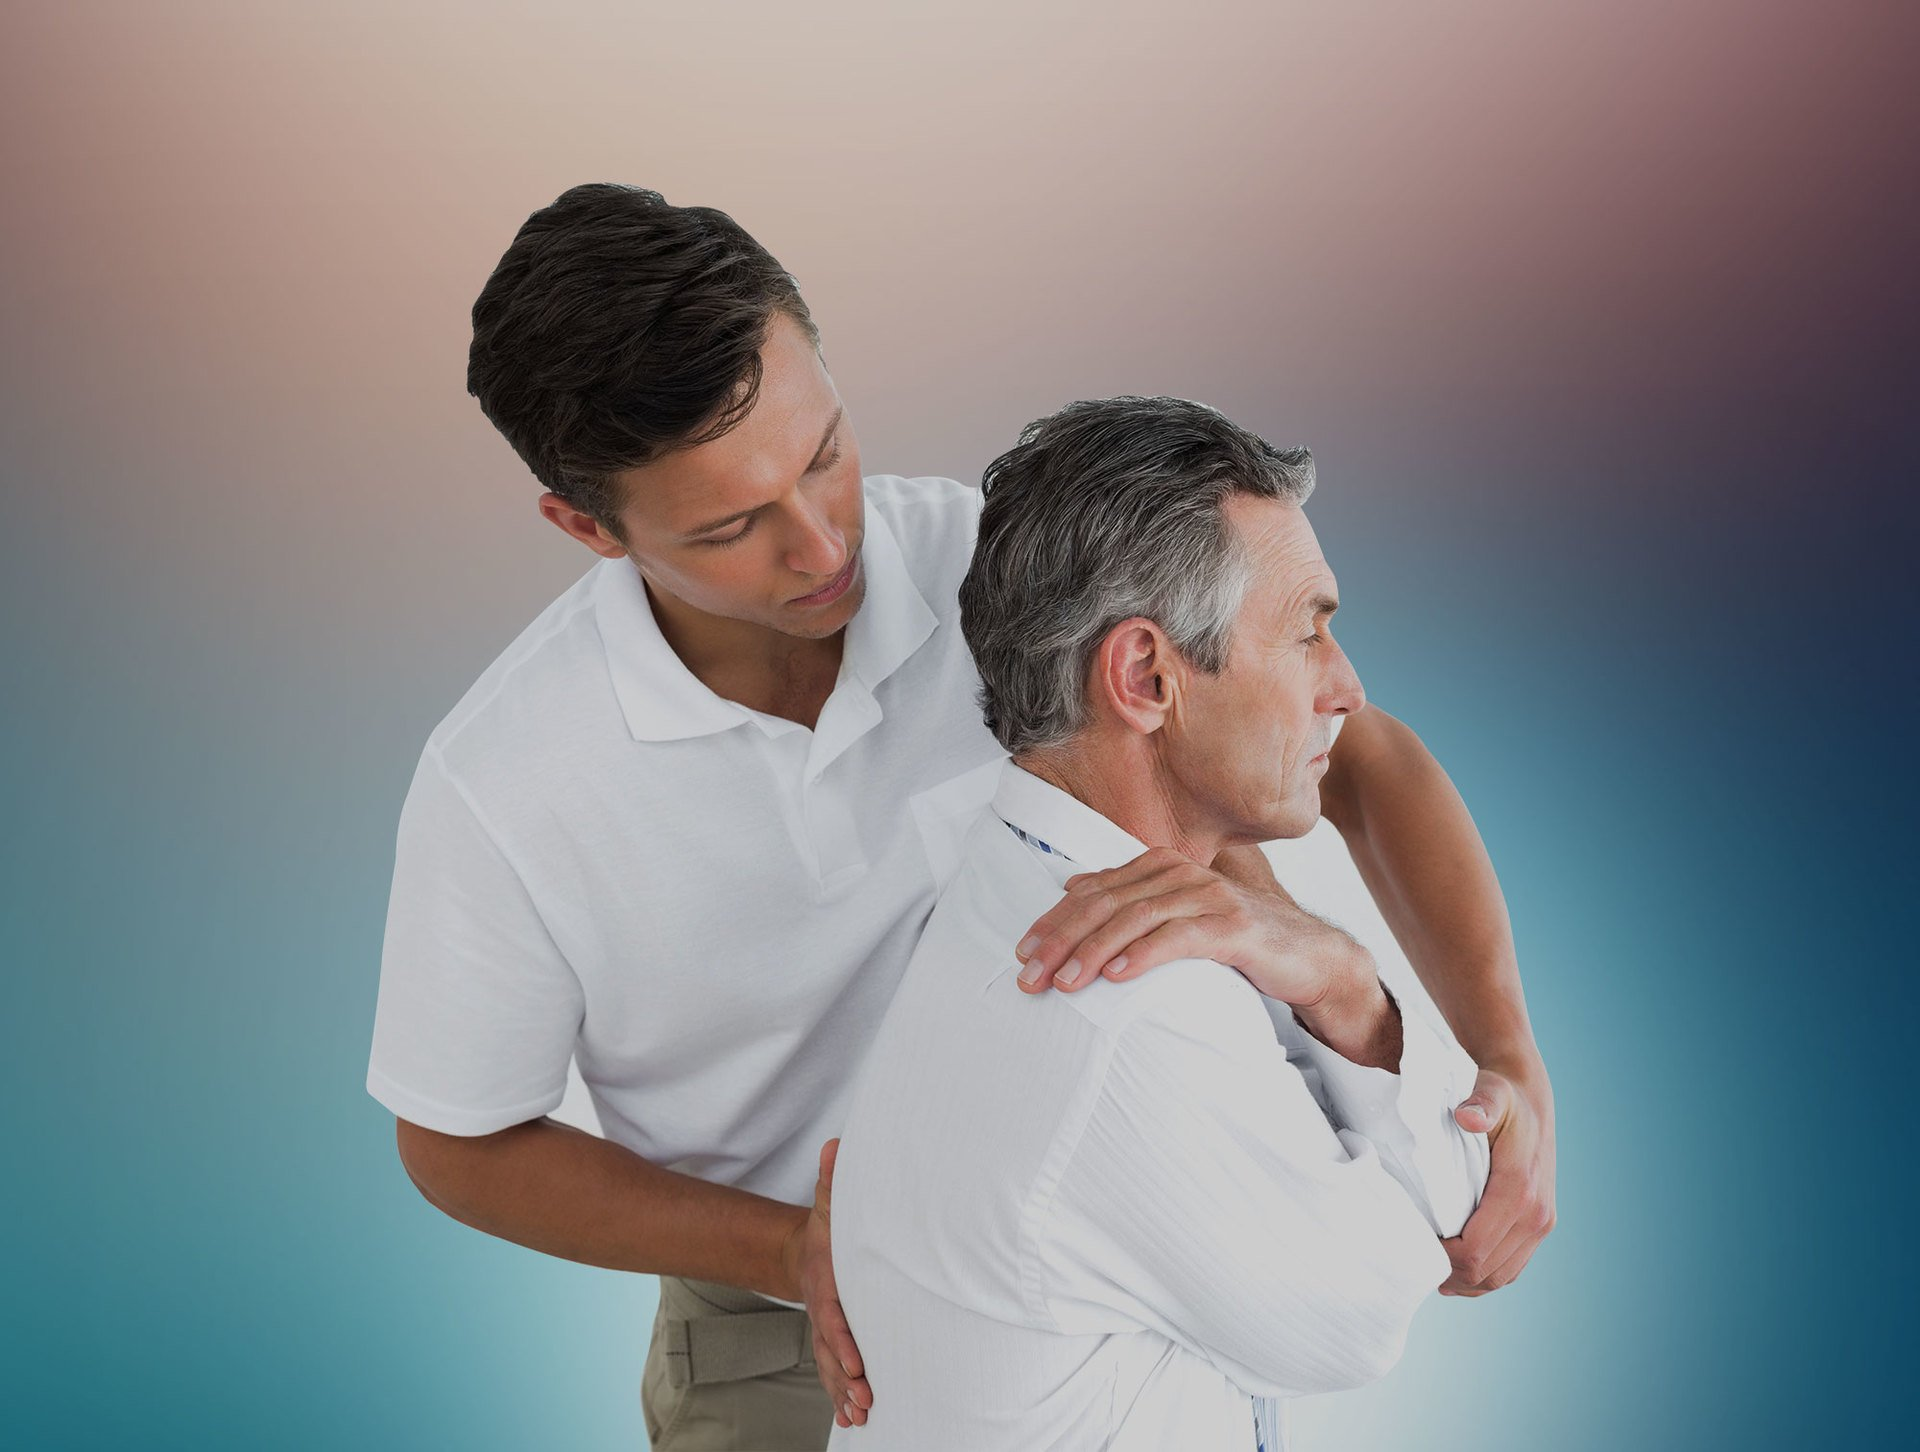 Effective chiropractic service